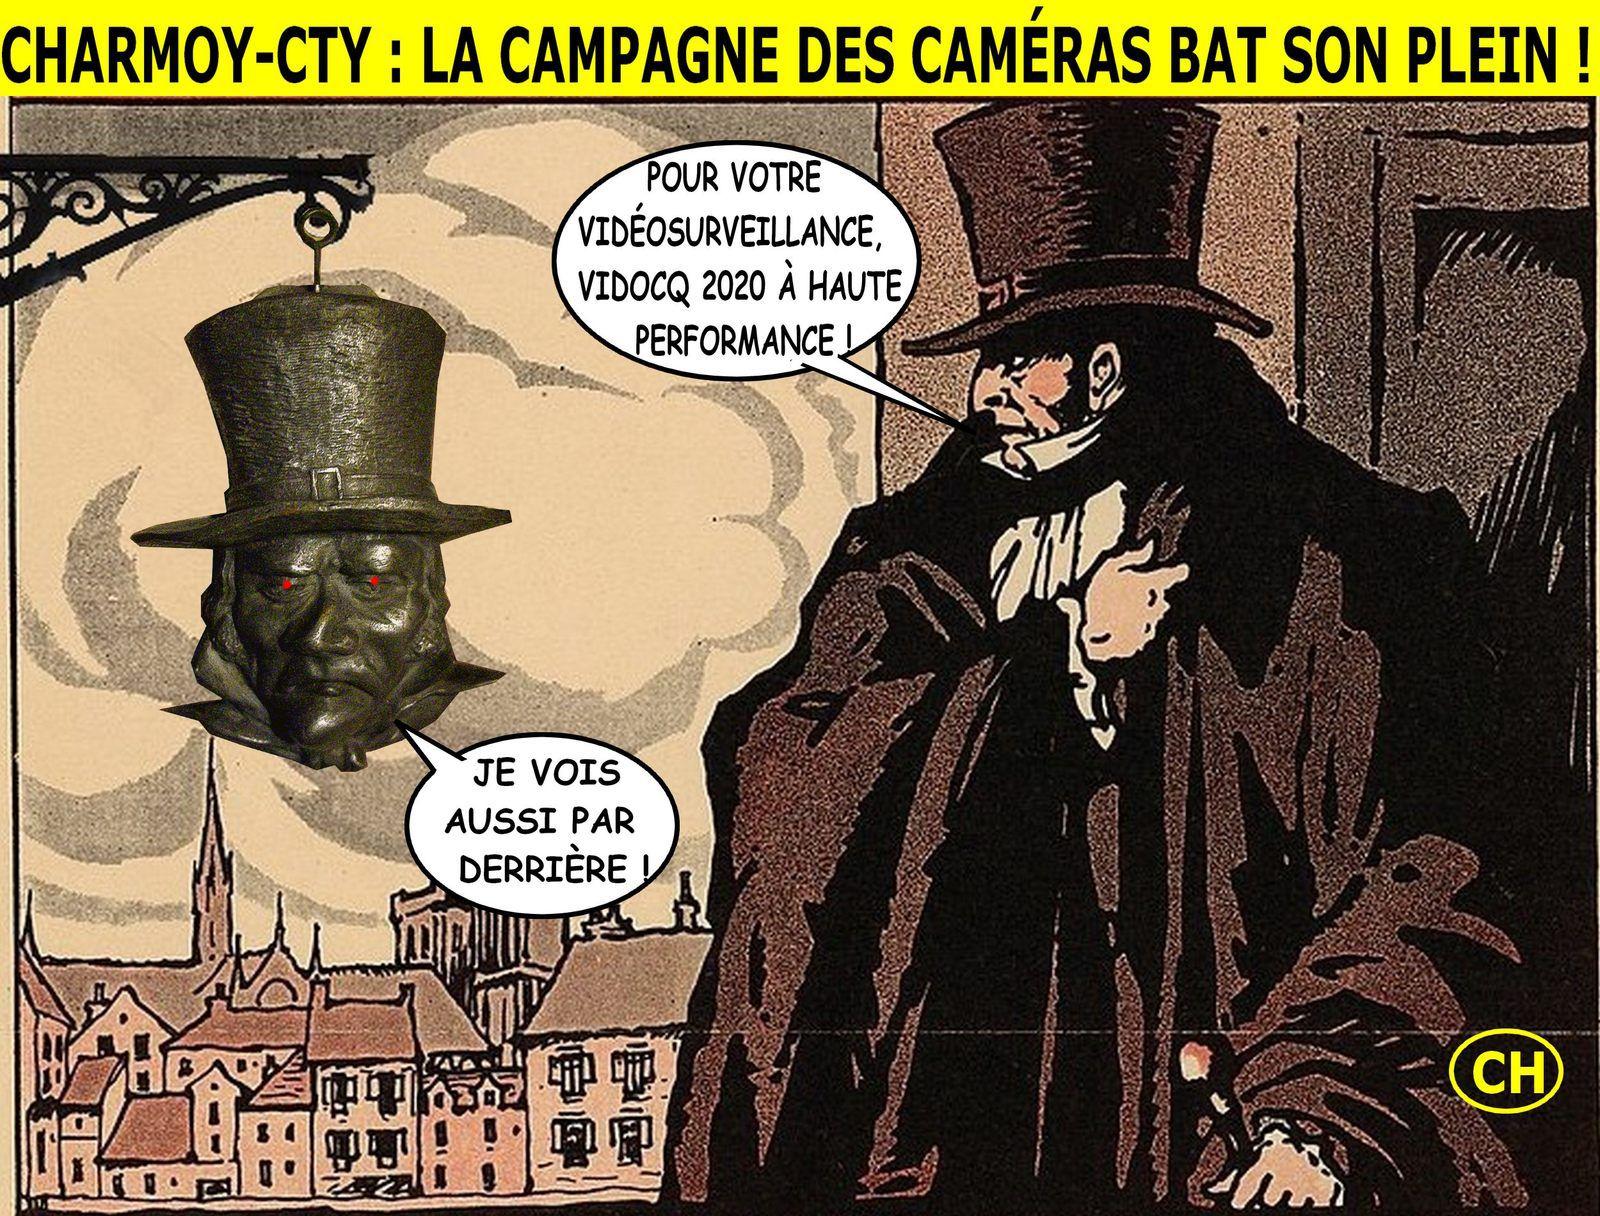 Charmoy-City la campagne des caméras bat son plein.jpg